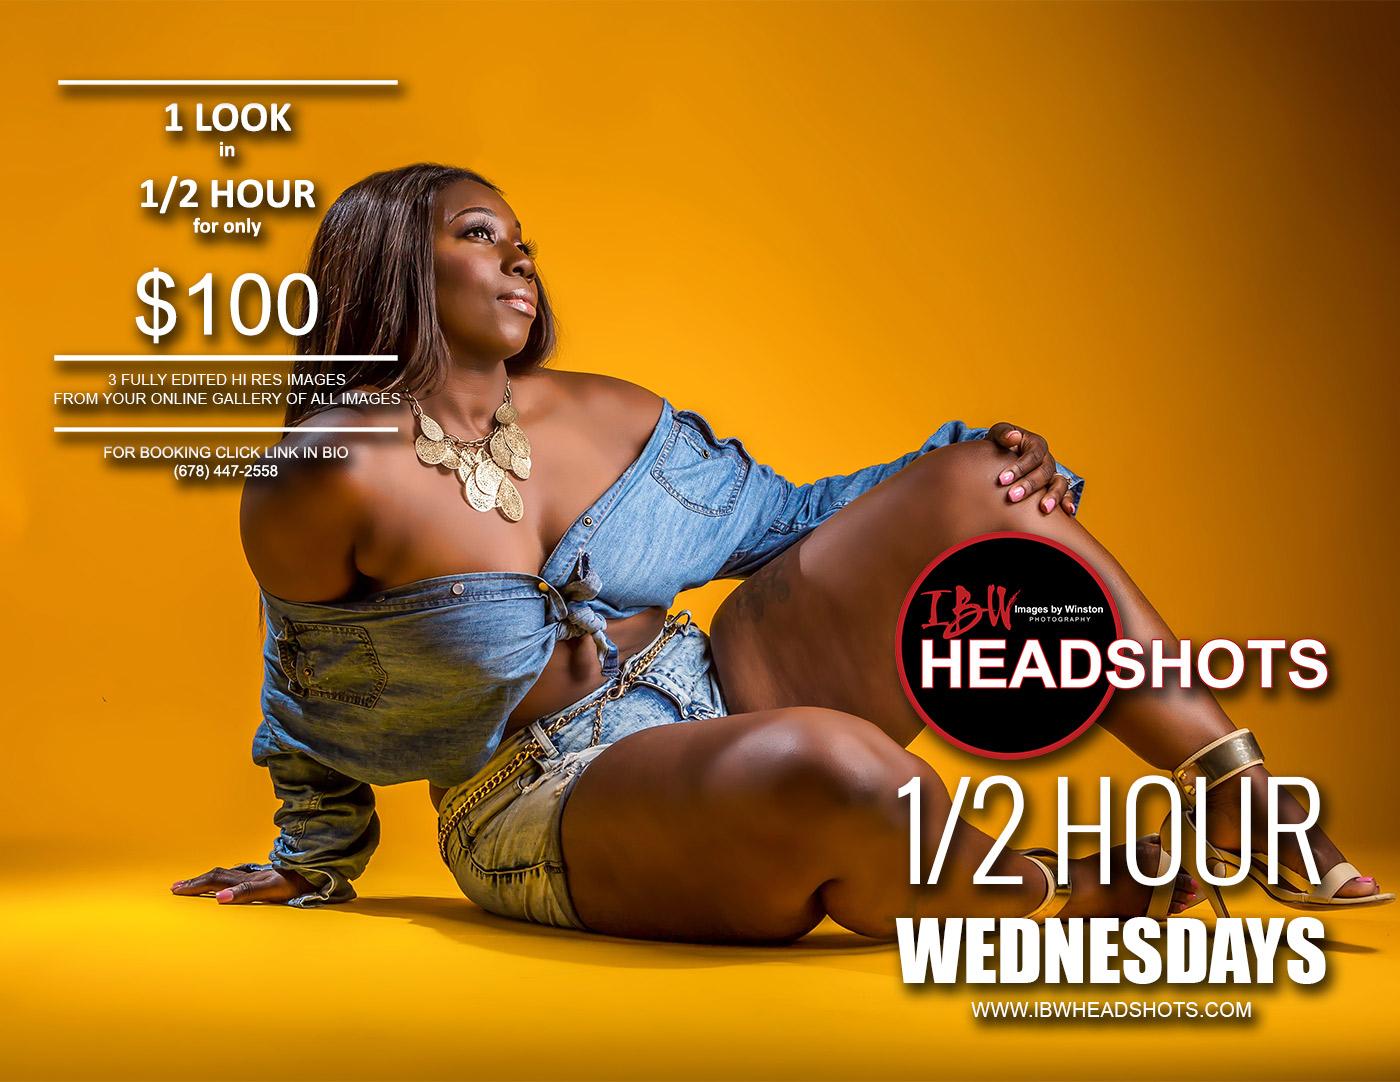 Half-Hour-Wednesday_ad4